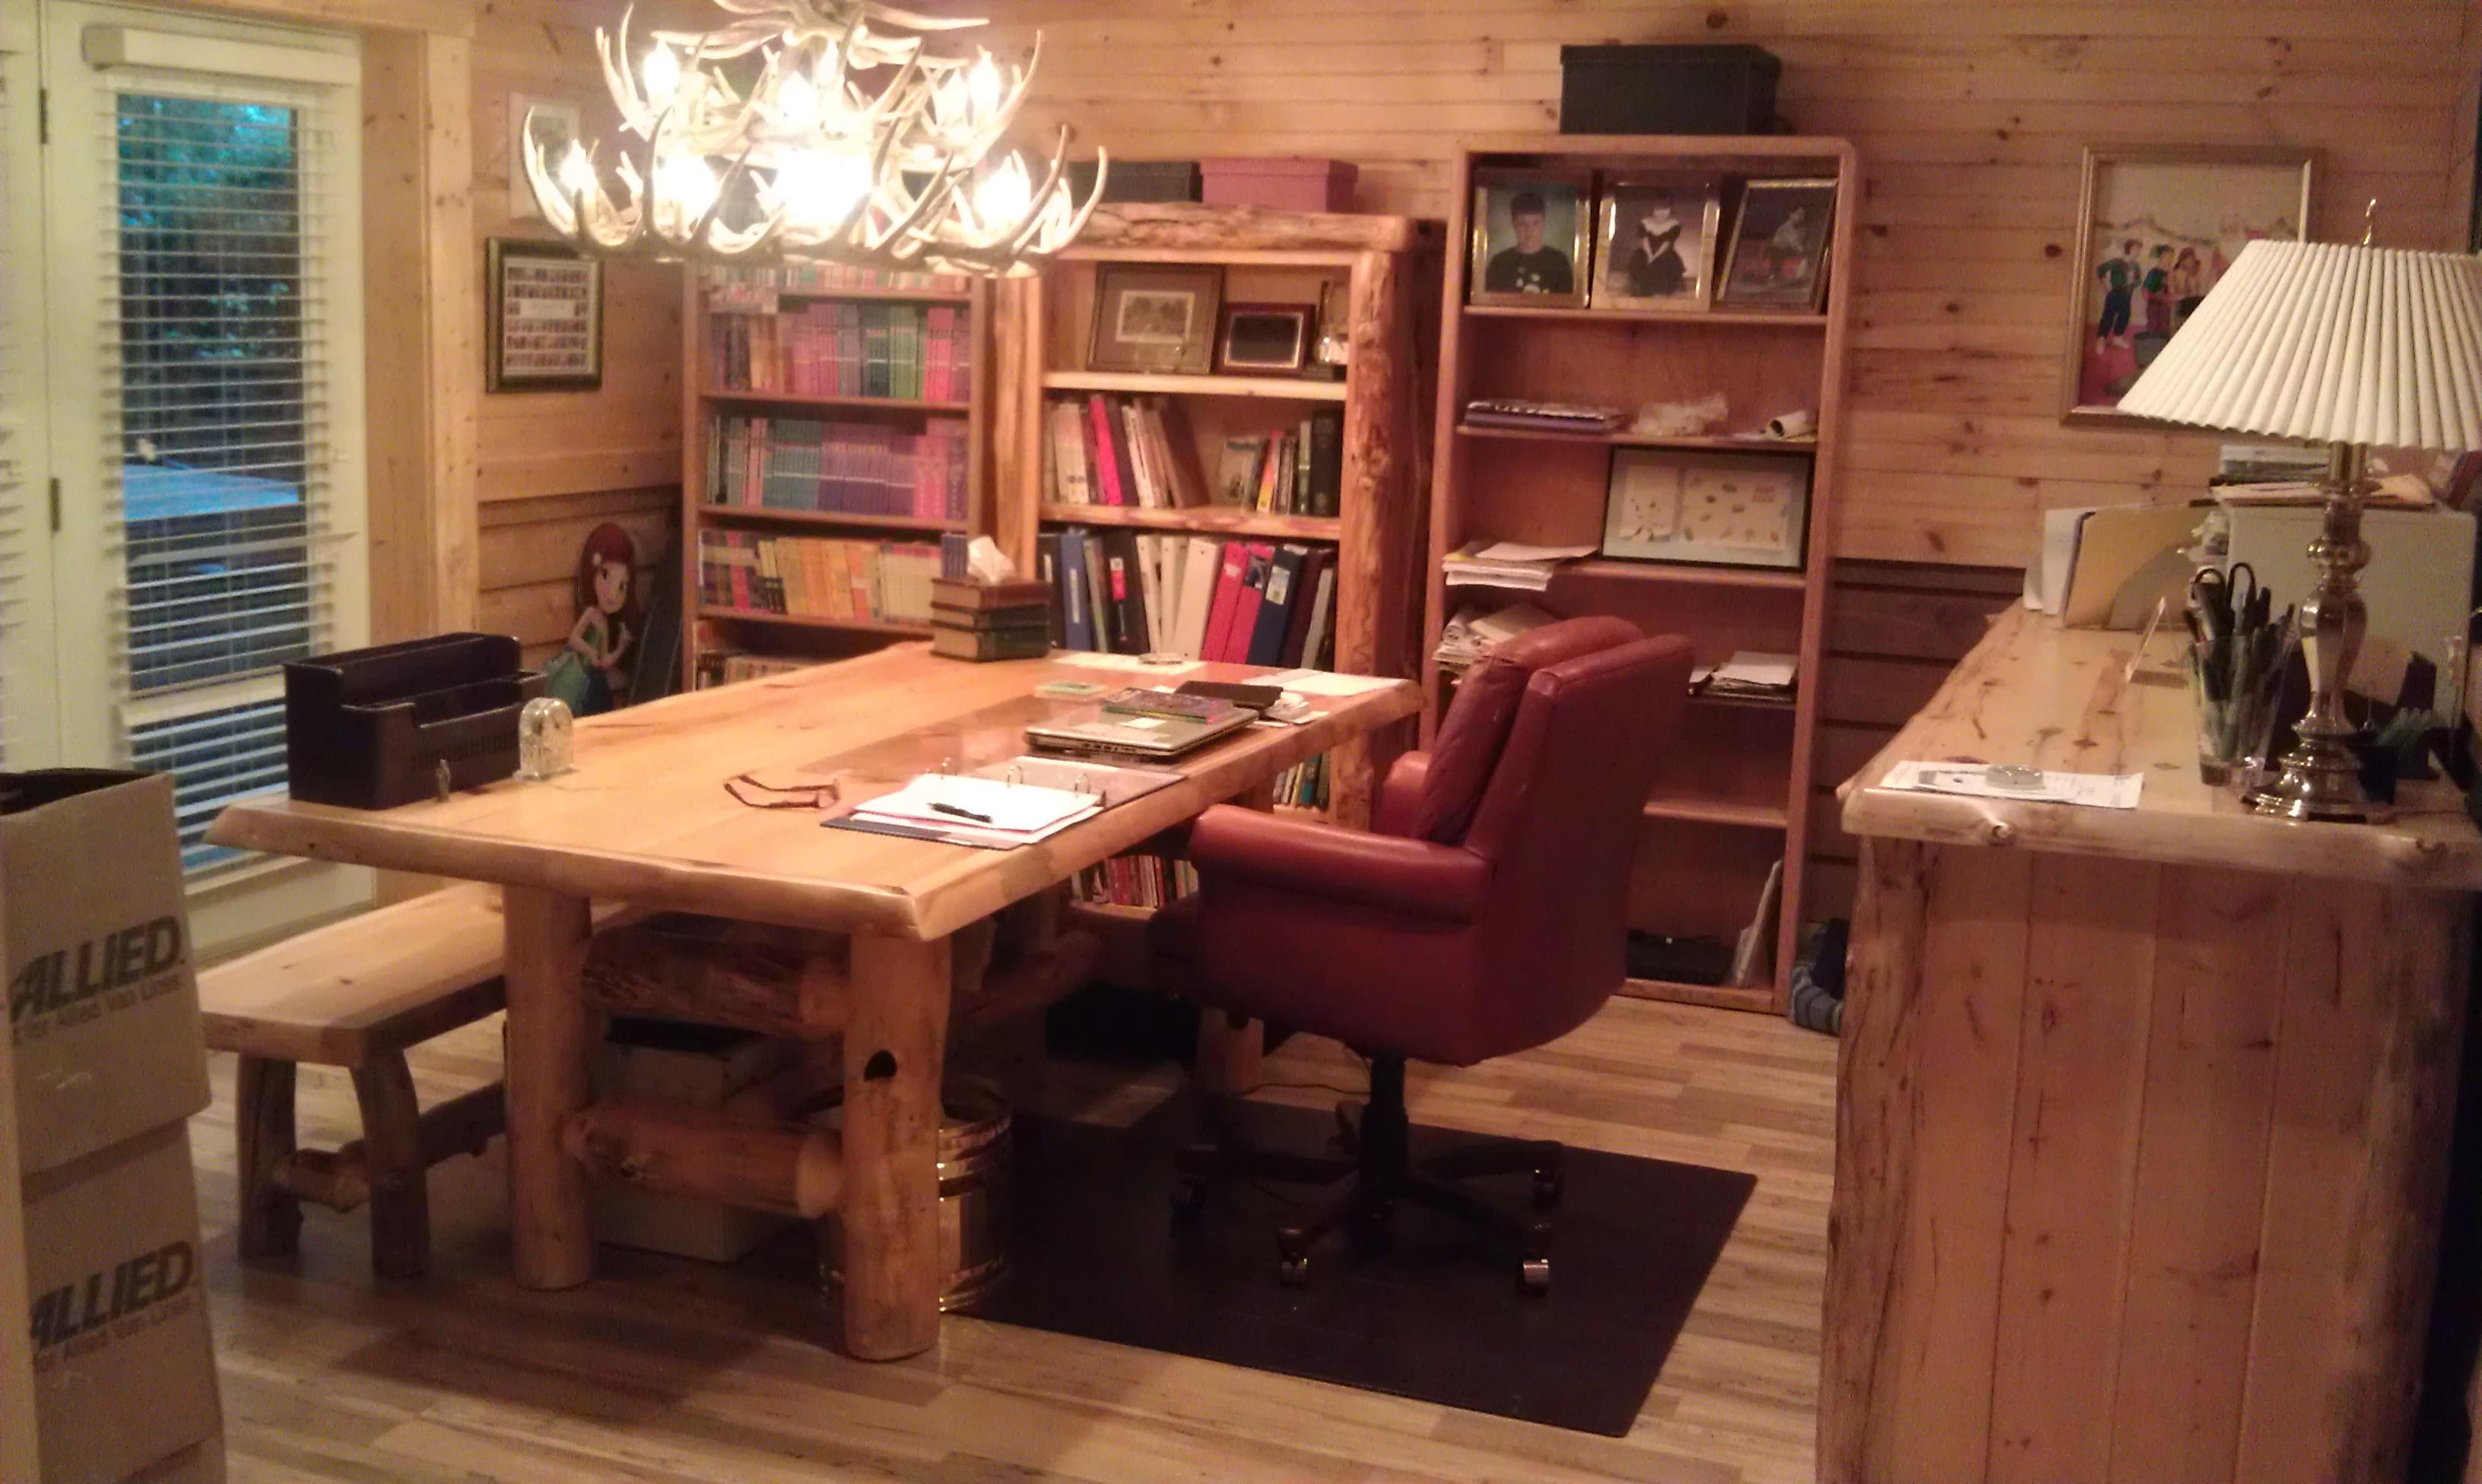 Debbie's new office